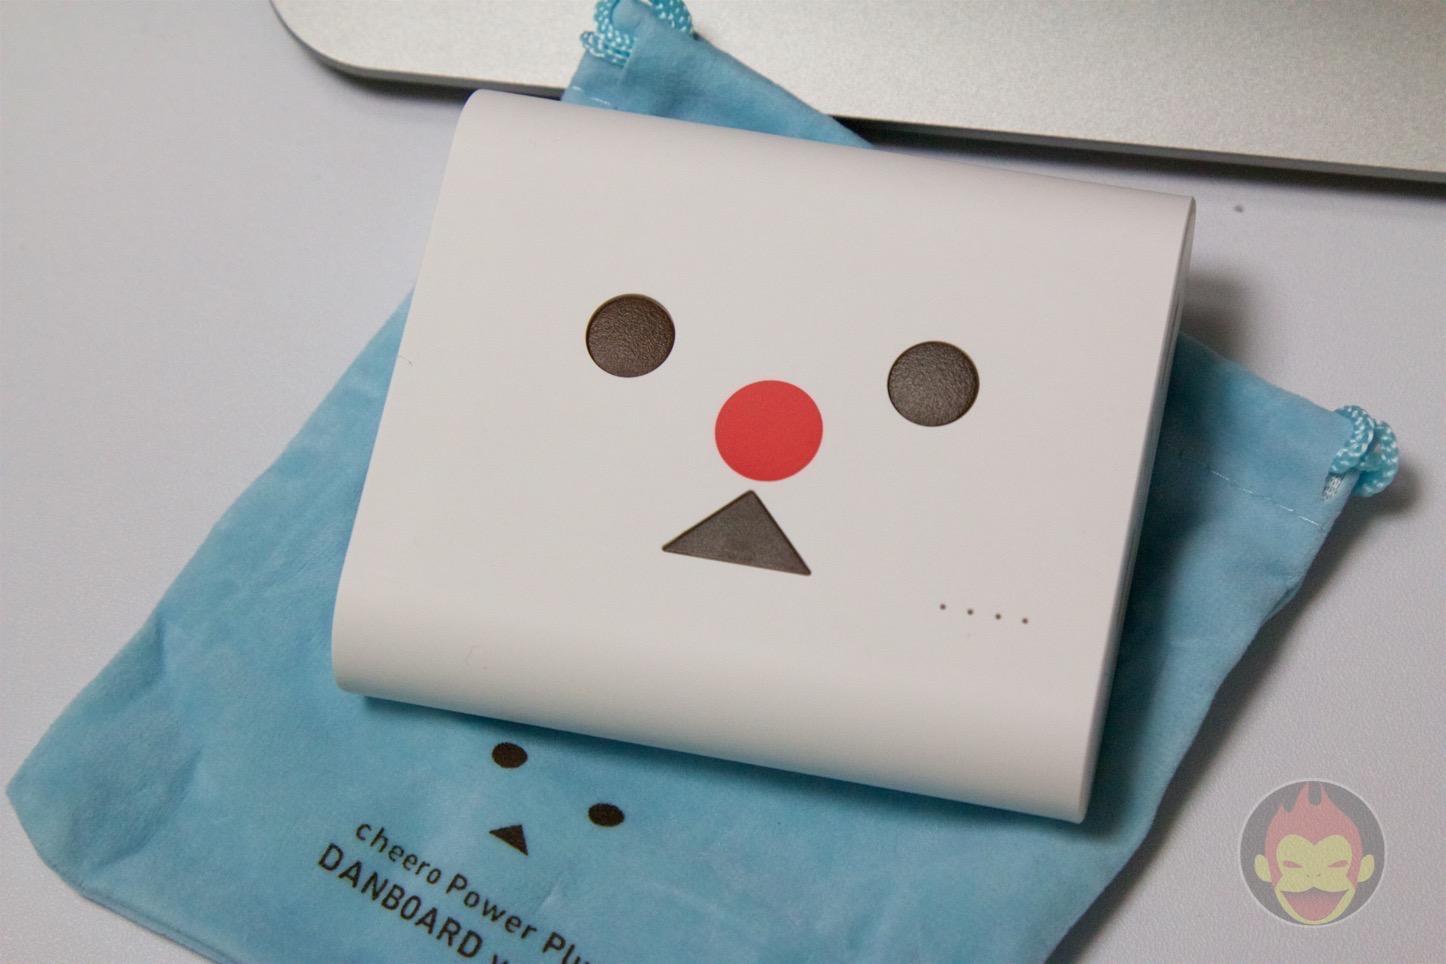 cheero-Powerplus-3-DANBOARD-Version-Snowman-07.jpg